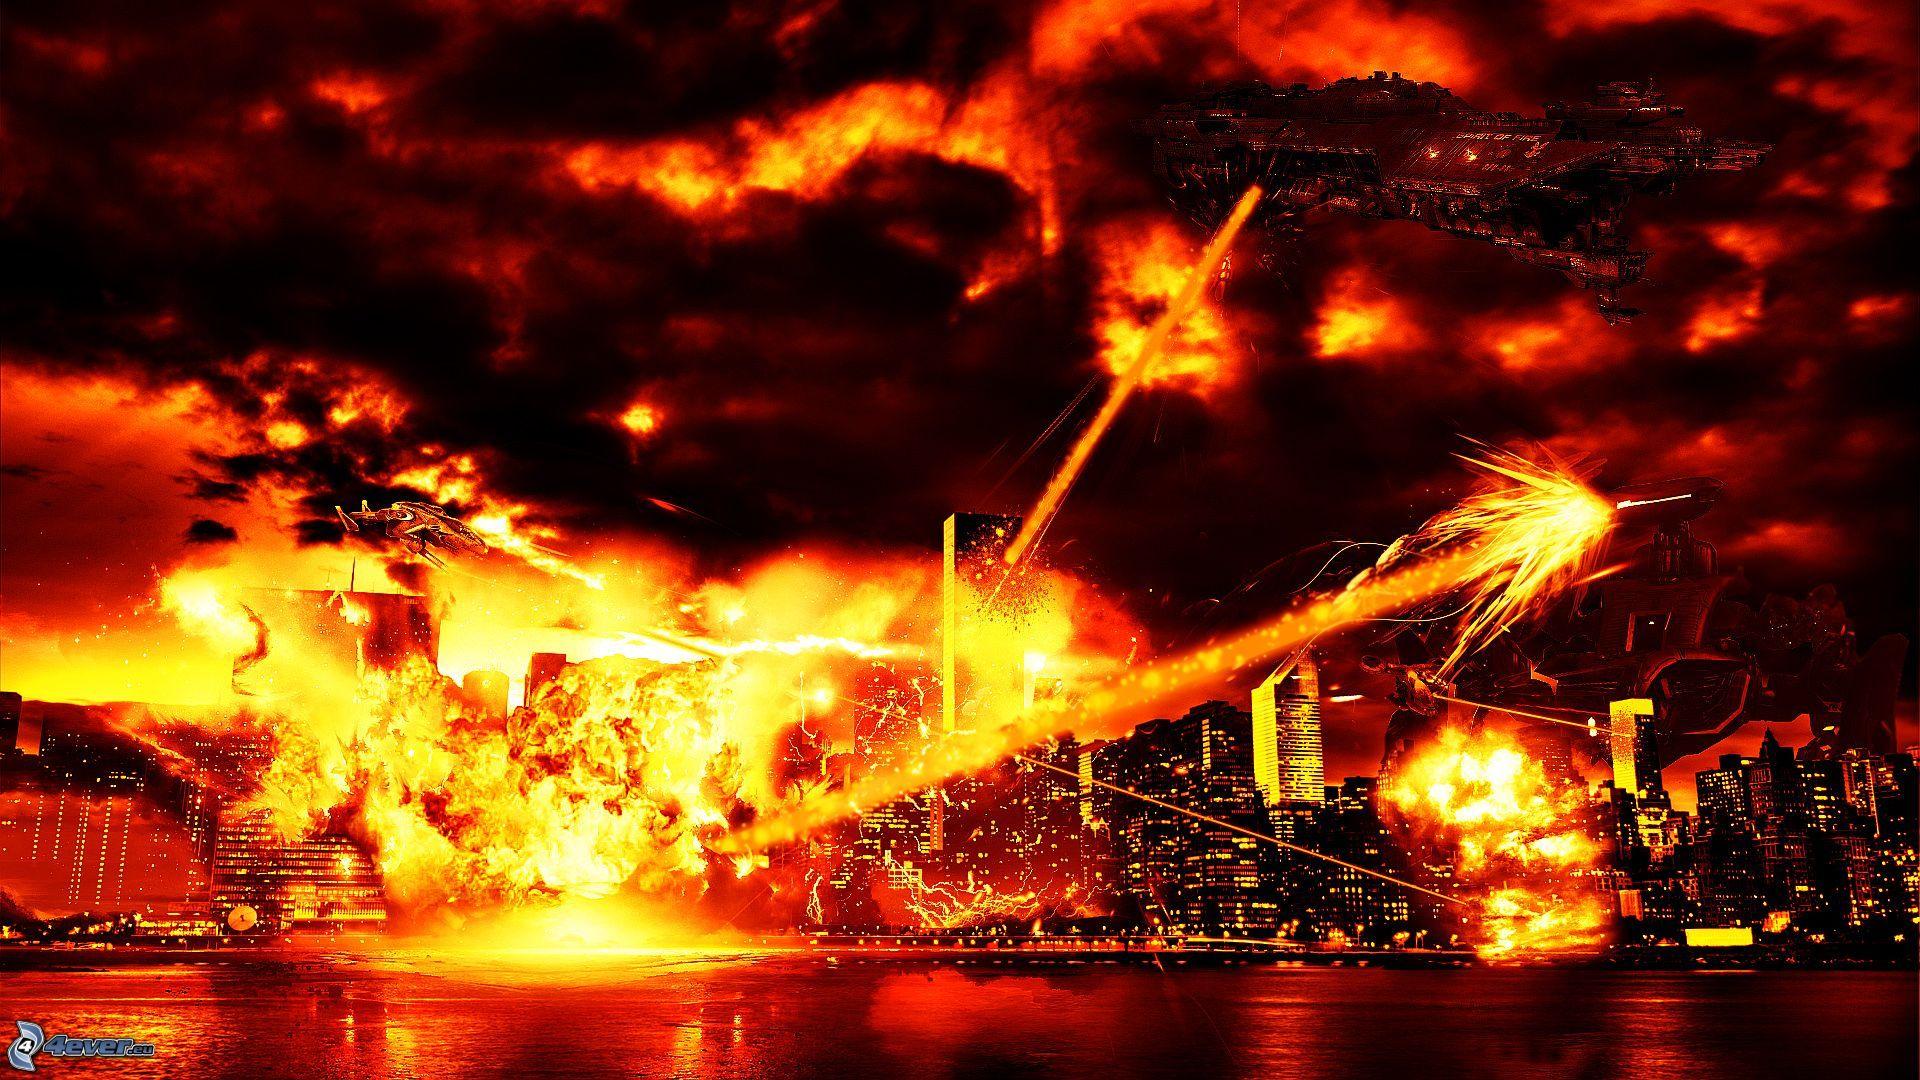 Destrtuction pictures Scifi fantasy art Apocalyptic 1920x1080